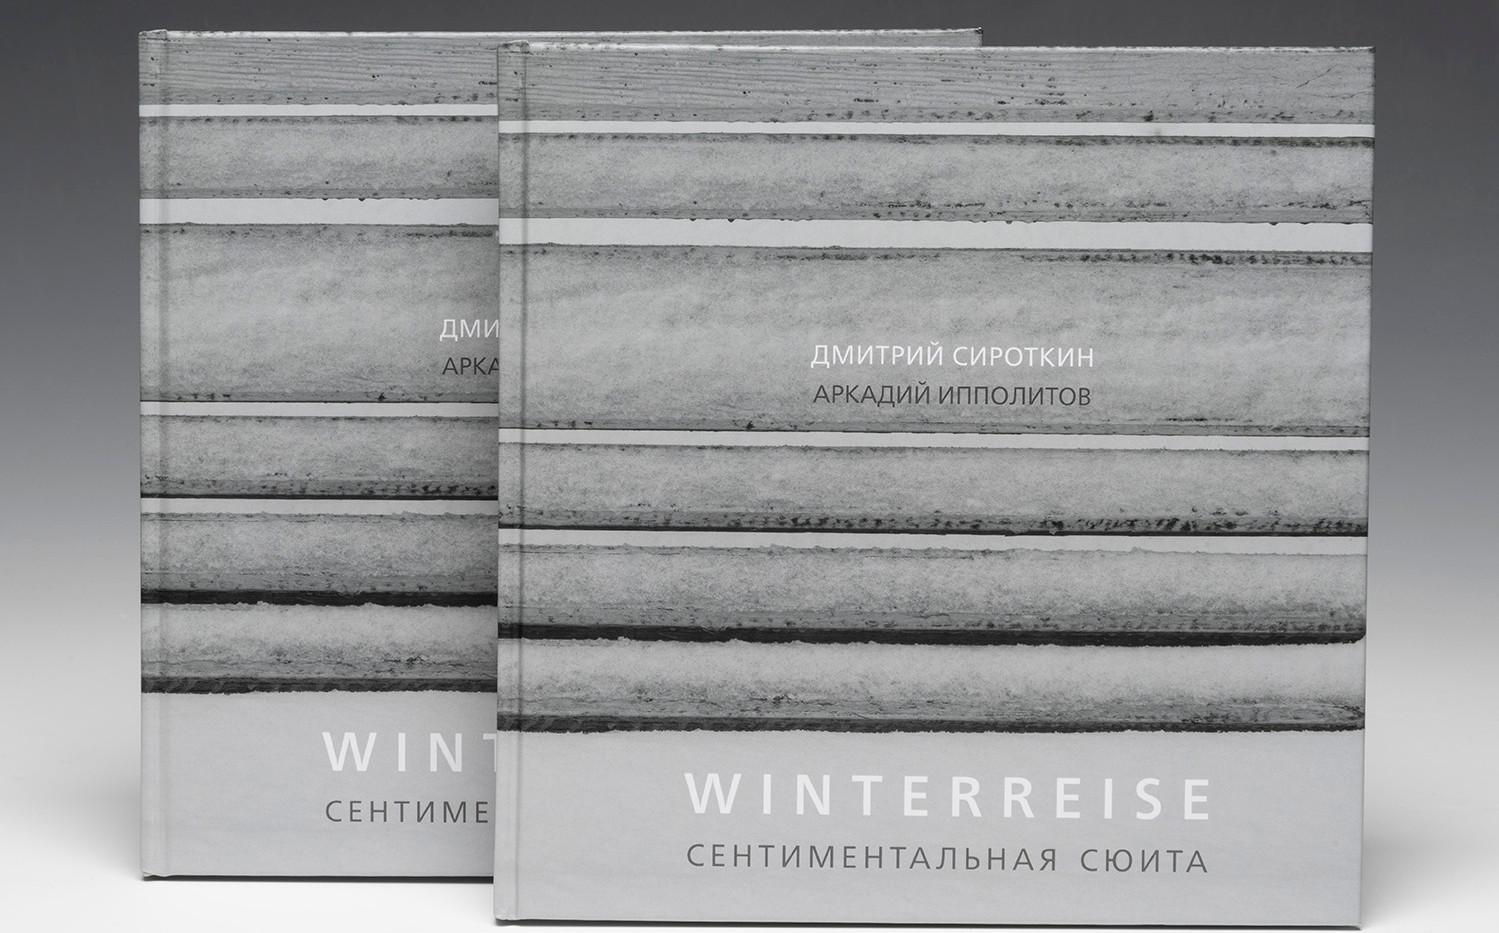 book_winter_01.jpg